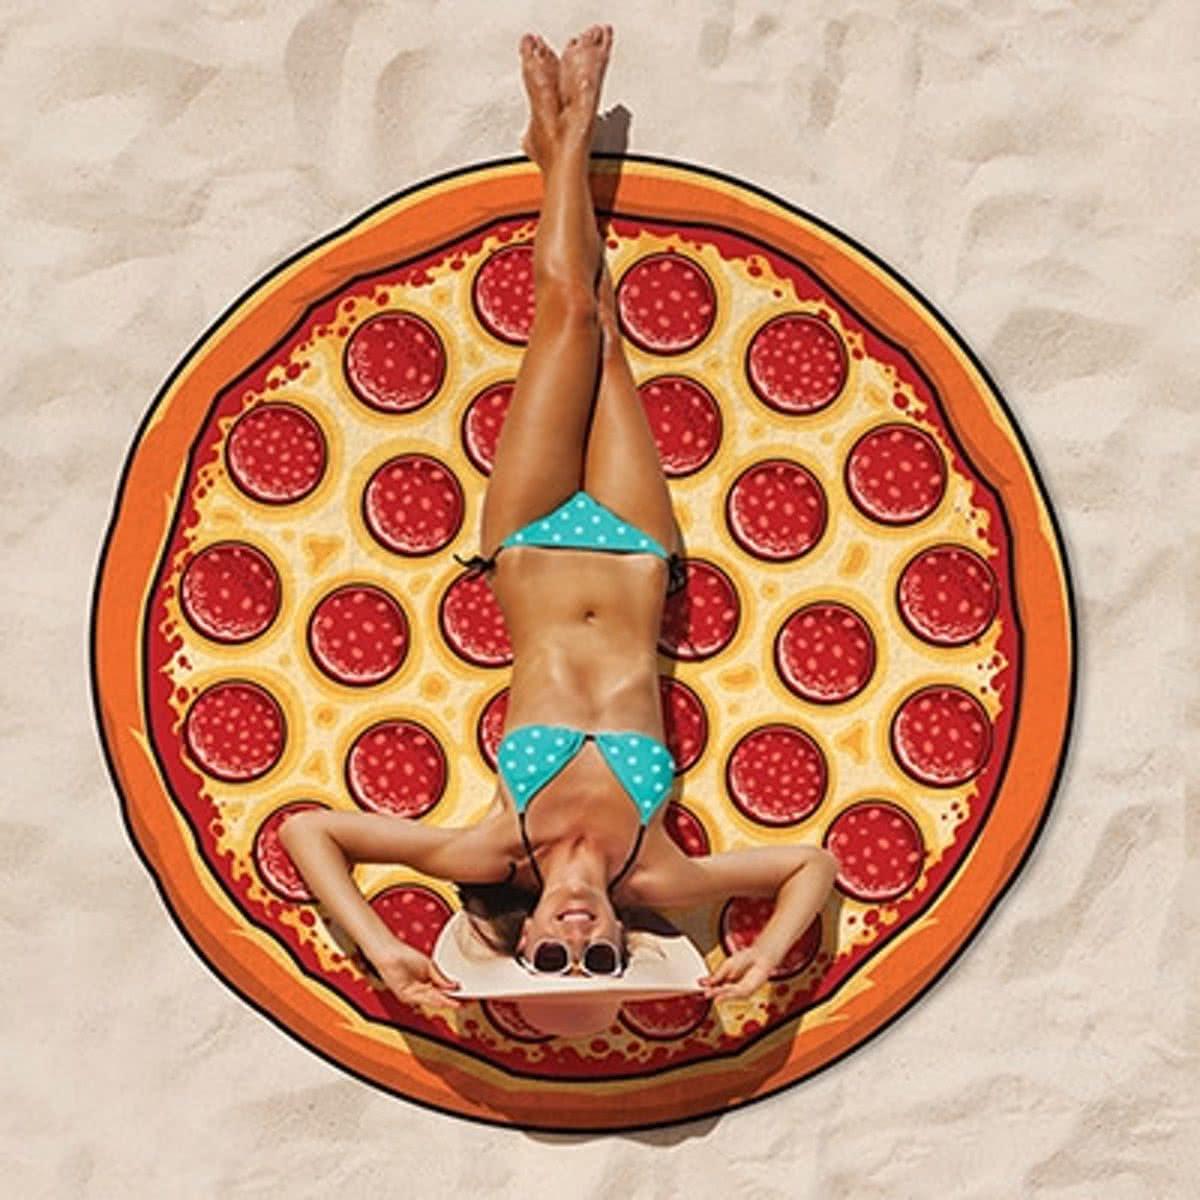 4363421992f Pizza Strandlaken – Beach Blanket Pizza - Big Mouth badlaken - ø 1,5 meter